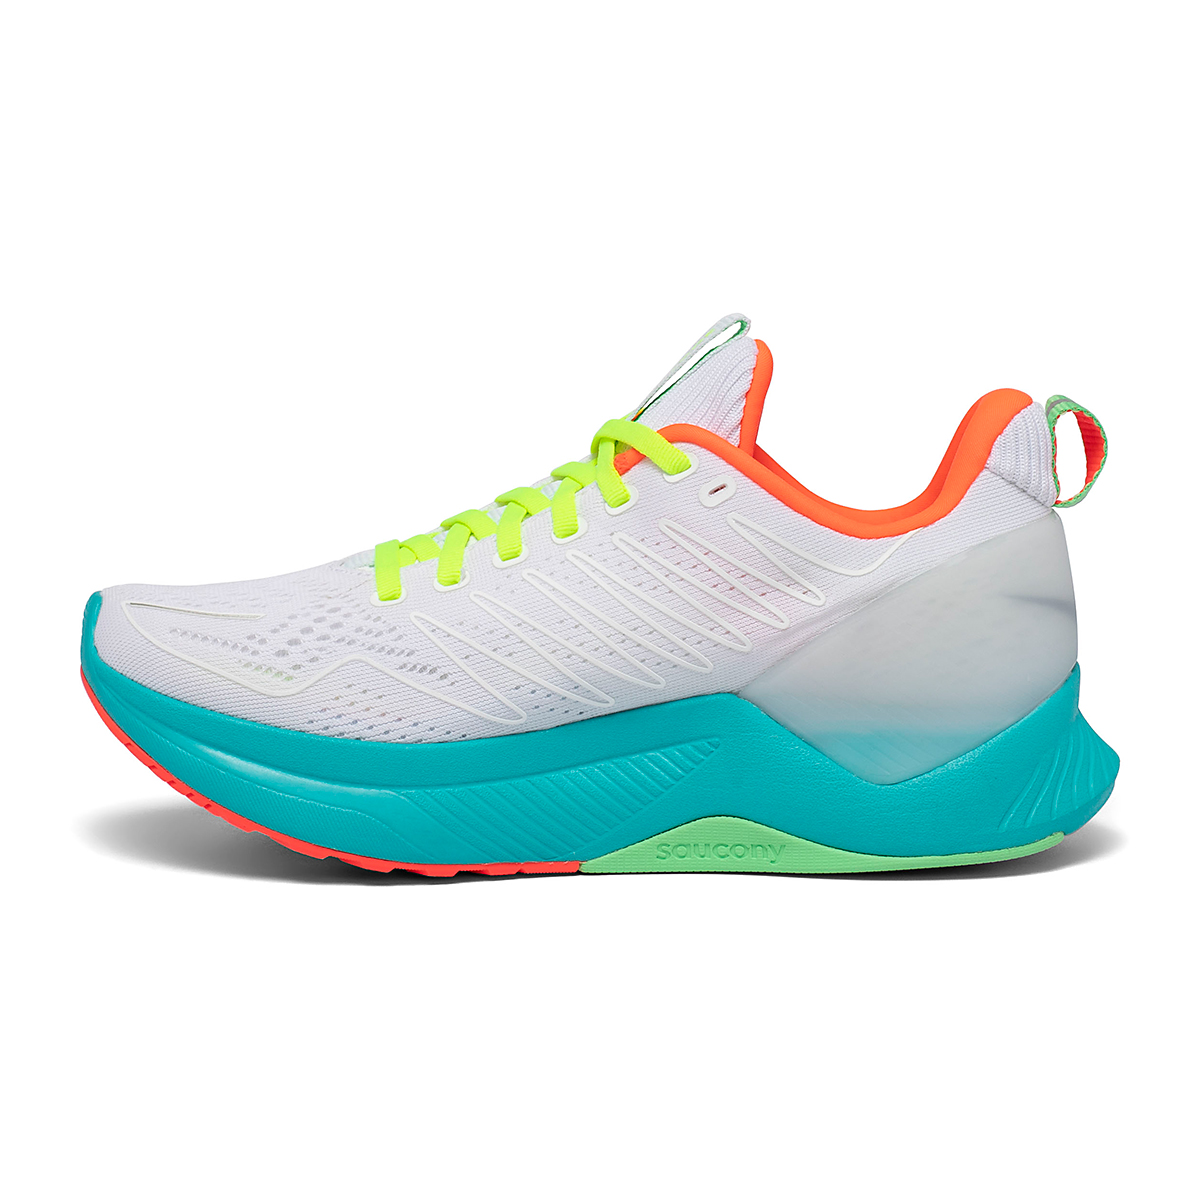 Women's Saucony Endorphin Shift Running Shoe - Color: White Mutant - Size: 5 - Width: Regular, White Mutant, large, image 2